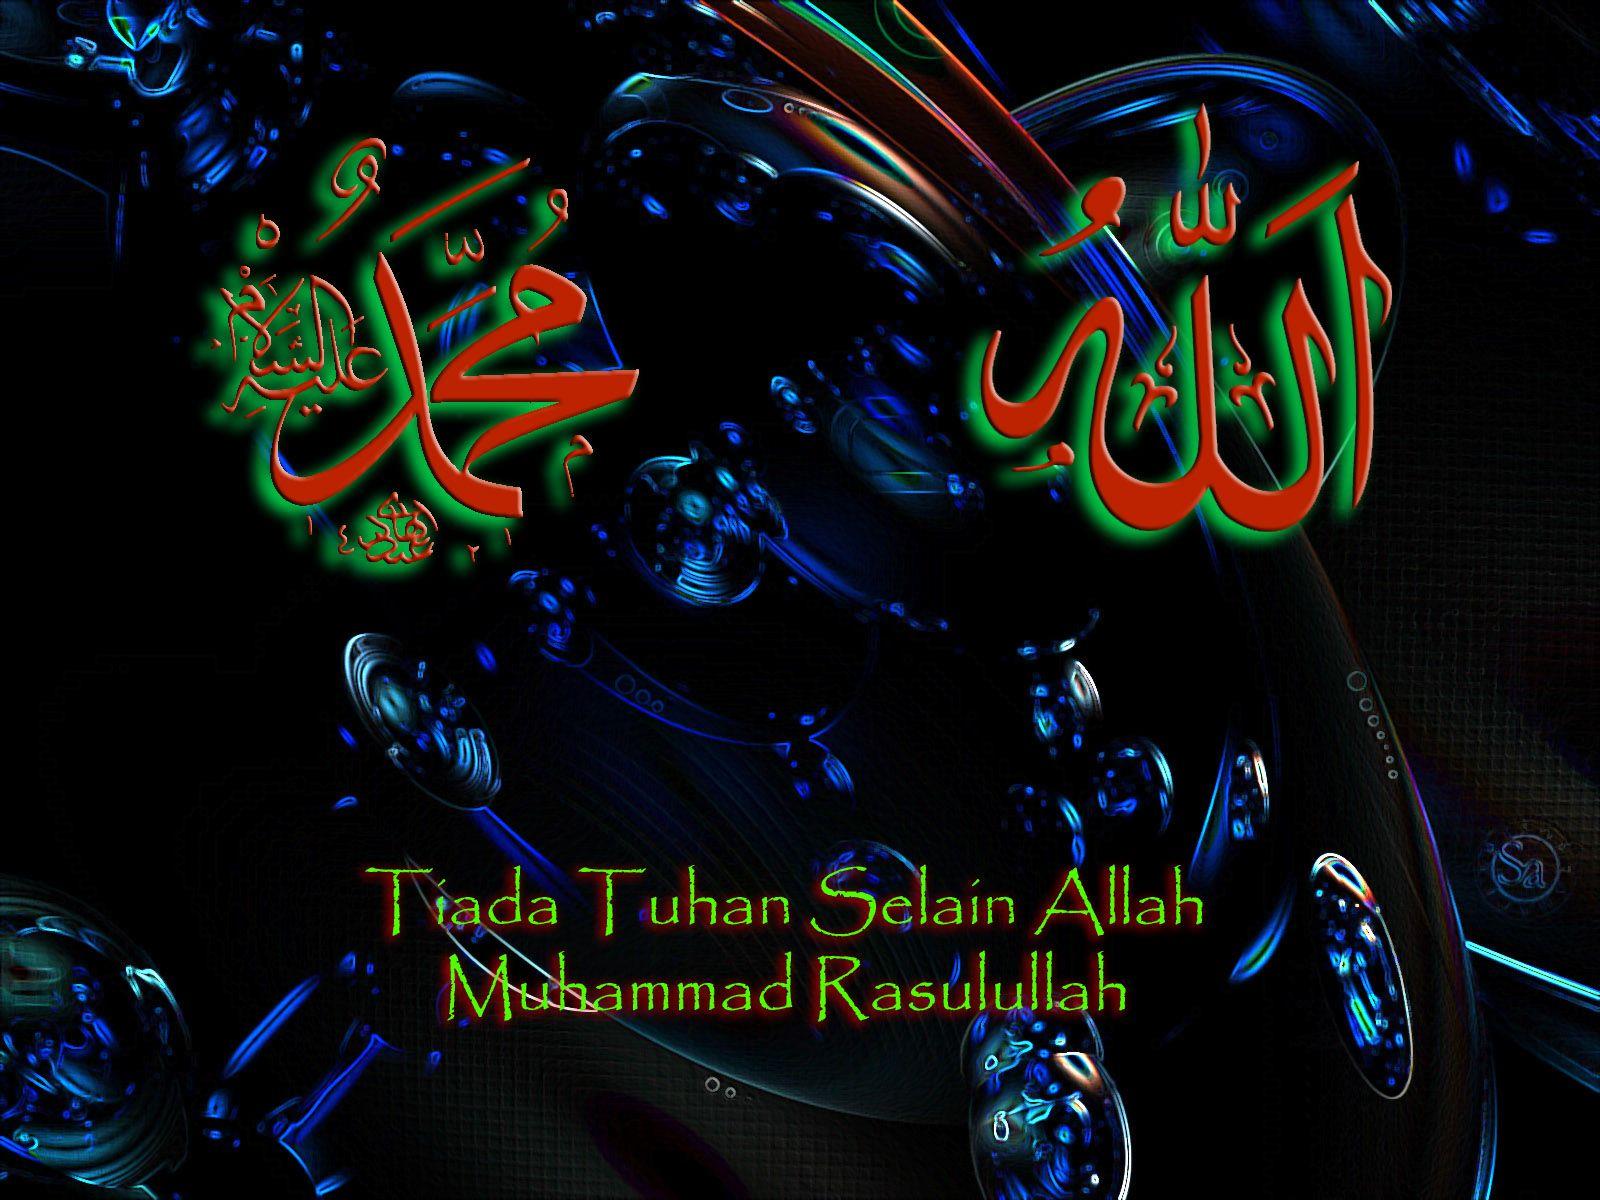 Download Gambar Wallpaper Kaligrafi Kumpulan Wallpaper